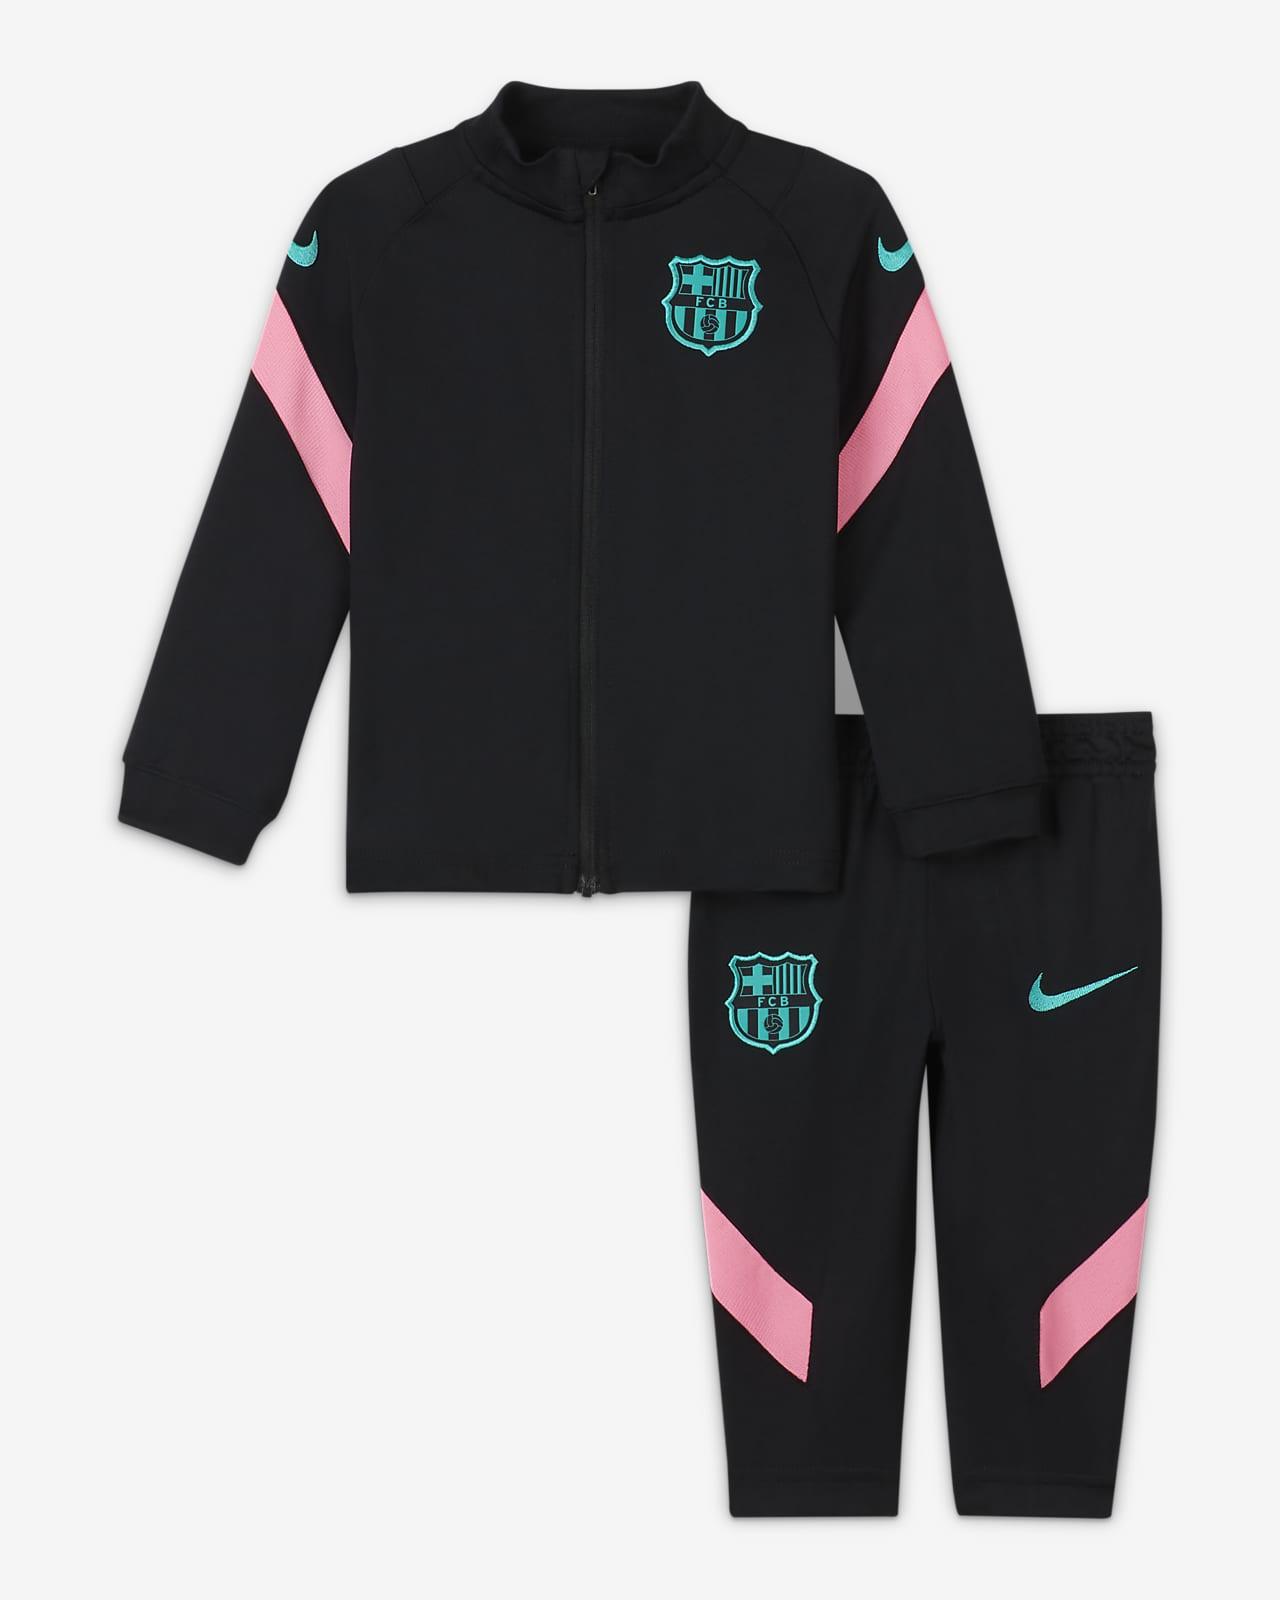 poco claro ventajoso libro de texto  FC Barcelona Strike Chándal de fútbol - Bebé e infantil. Nike ES